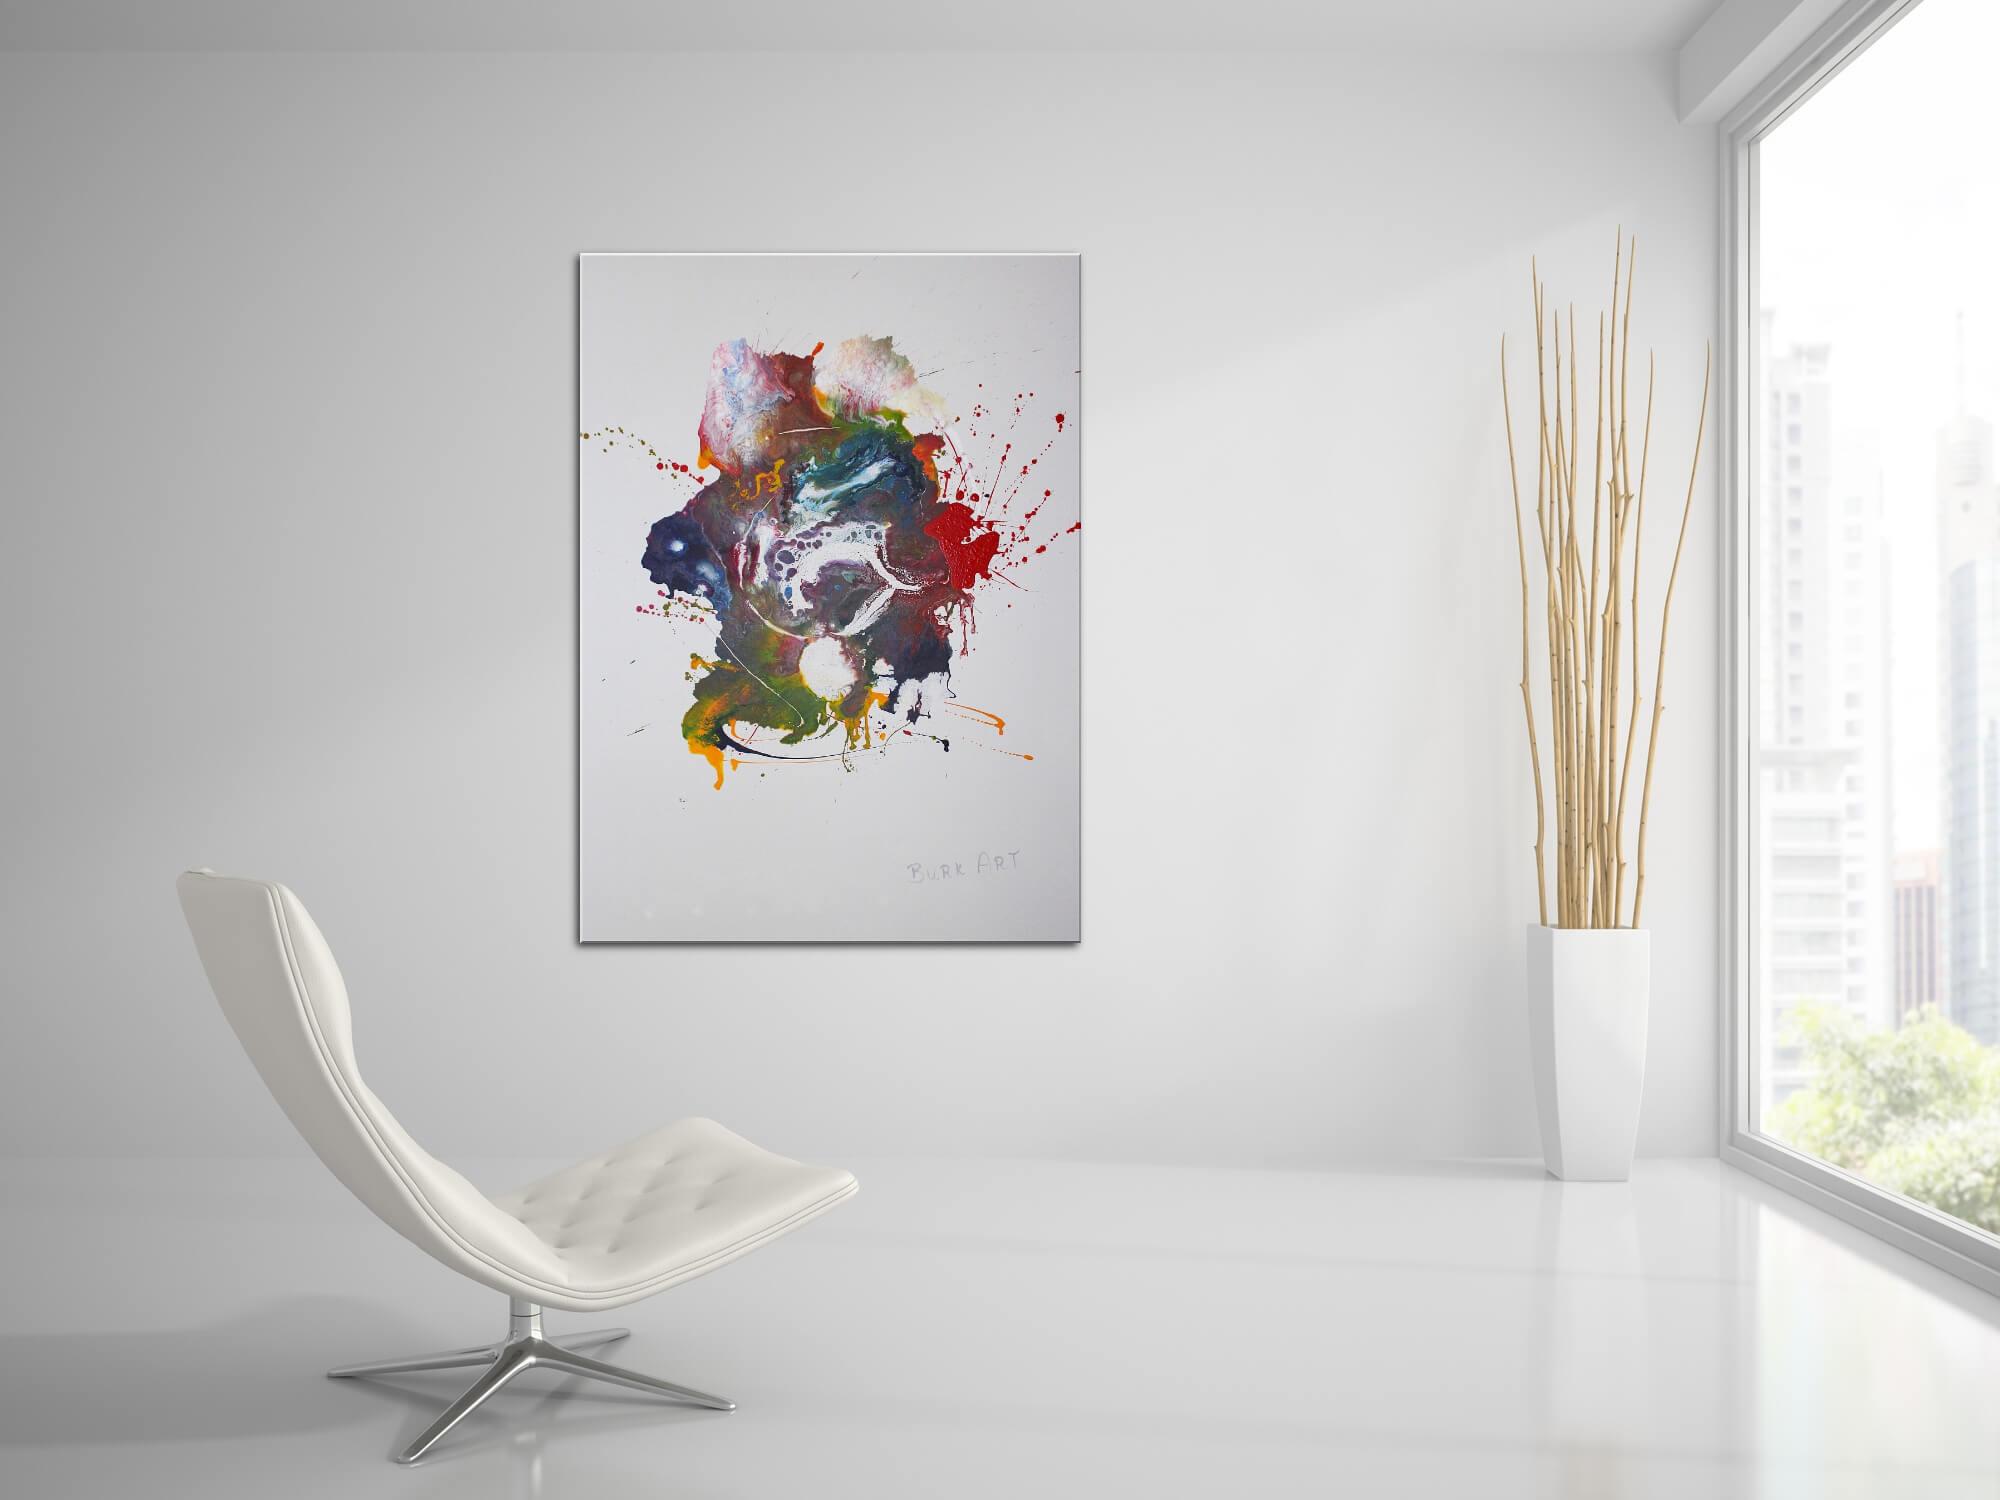 Wandbild XXL im Hochformat, bunt, Modern Art, Fliesstechnik